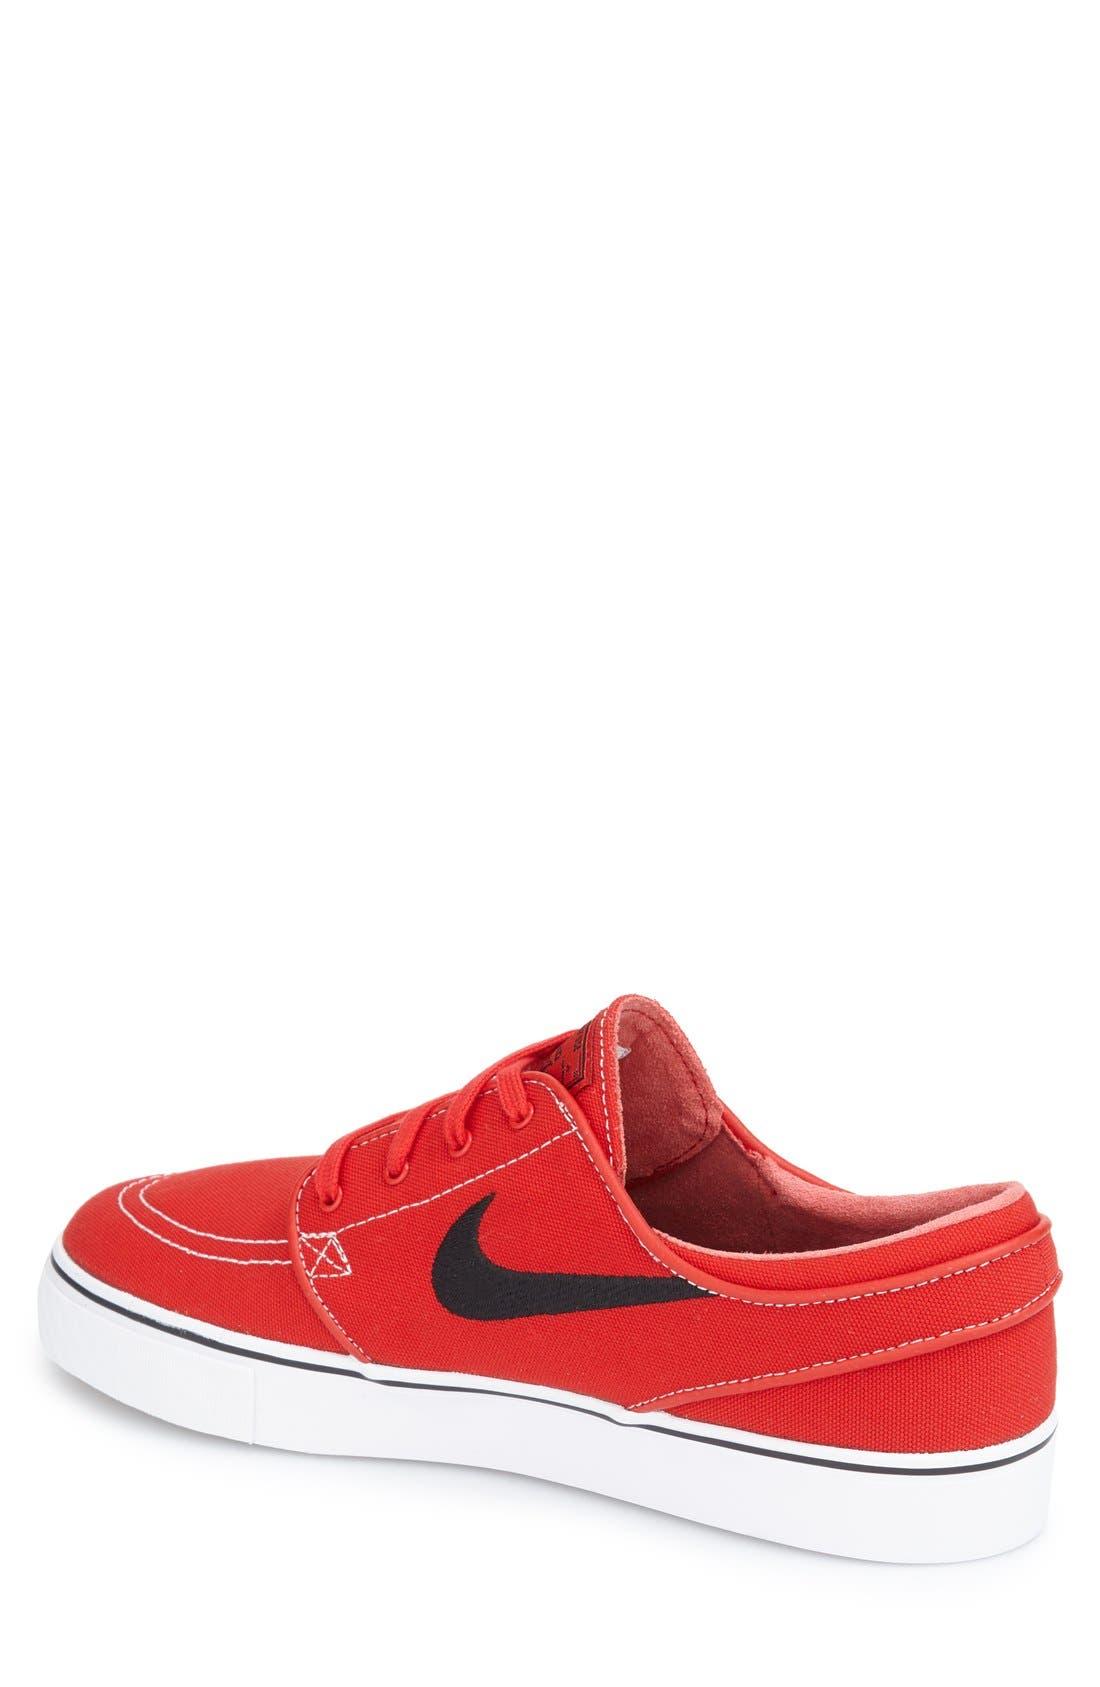 Zoom - Stefan Janoski SB Canvas Skate Shoe,                             Alternate thumbnail 168, color,